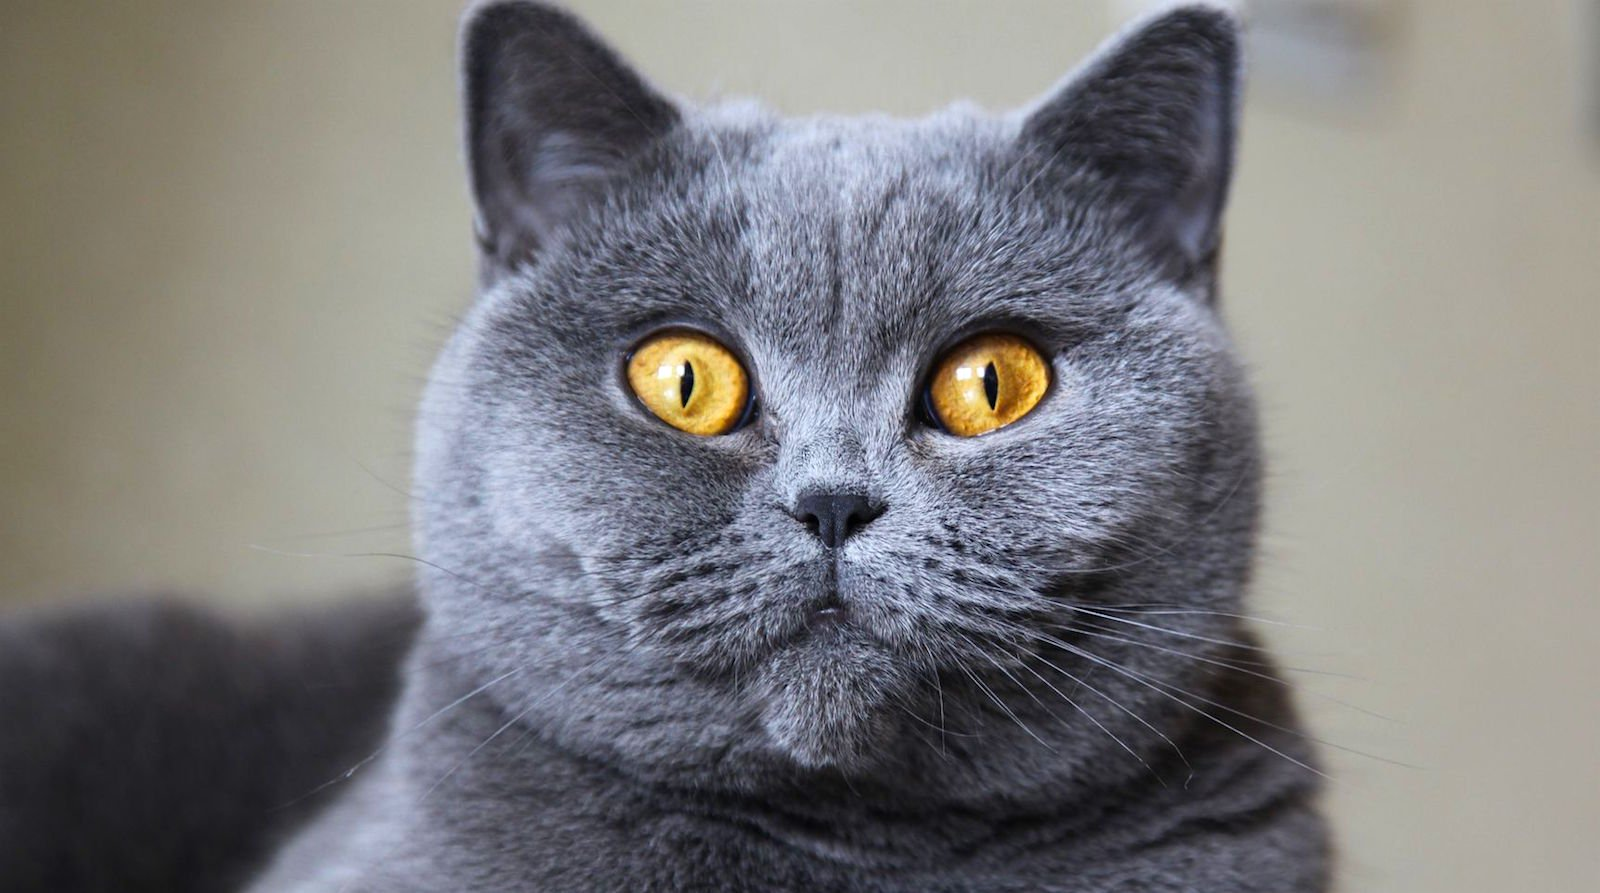 ¿Te gustaría adoptar un gato BritishShorthair?